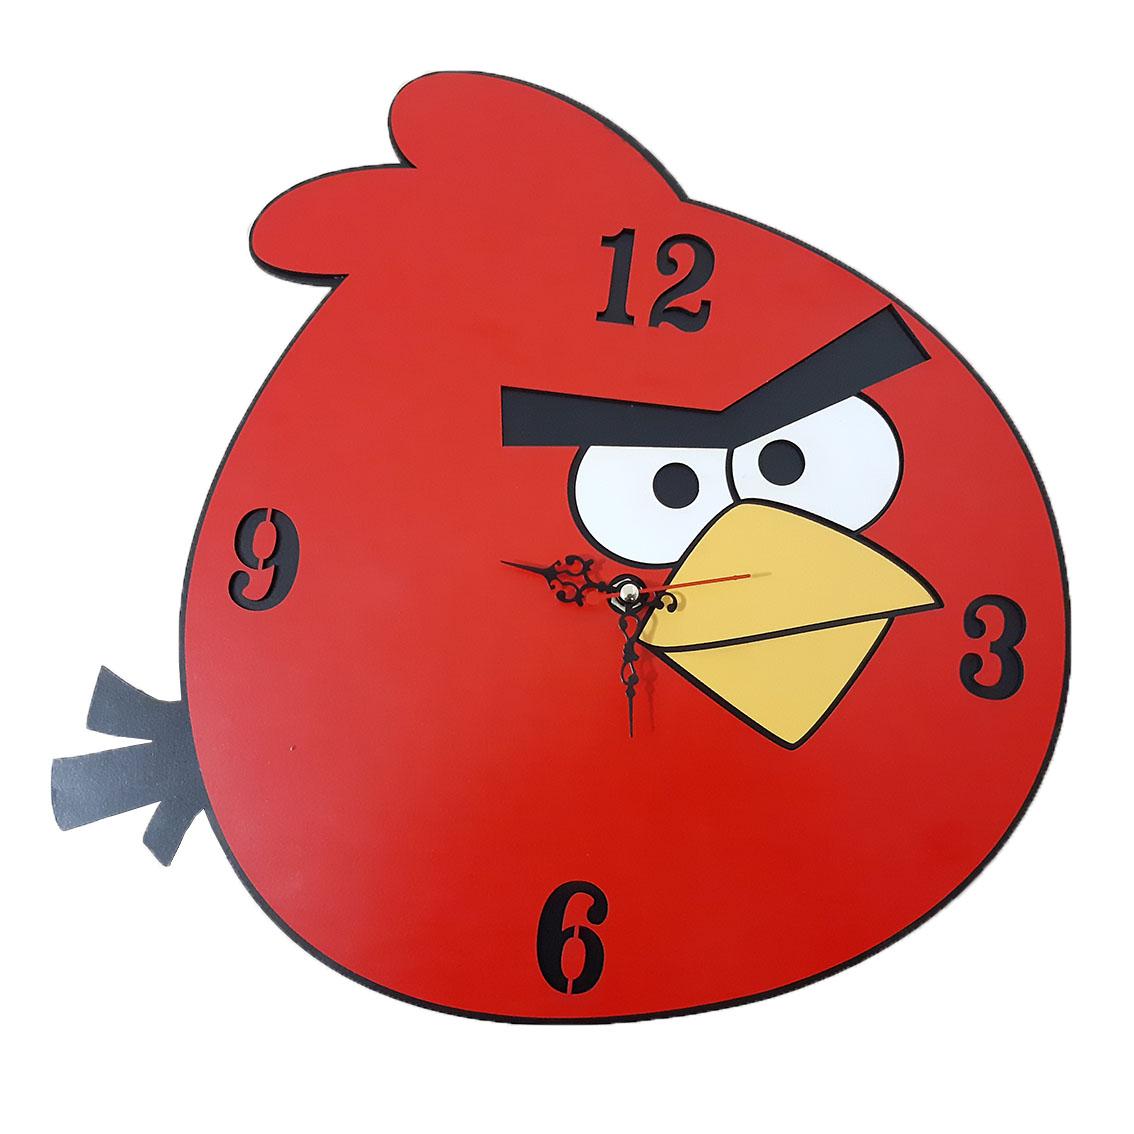 ساعت دیواری اتاق کودک طرح انگری کد 1303